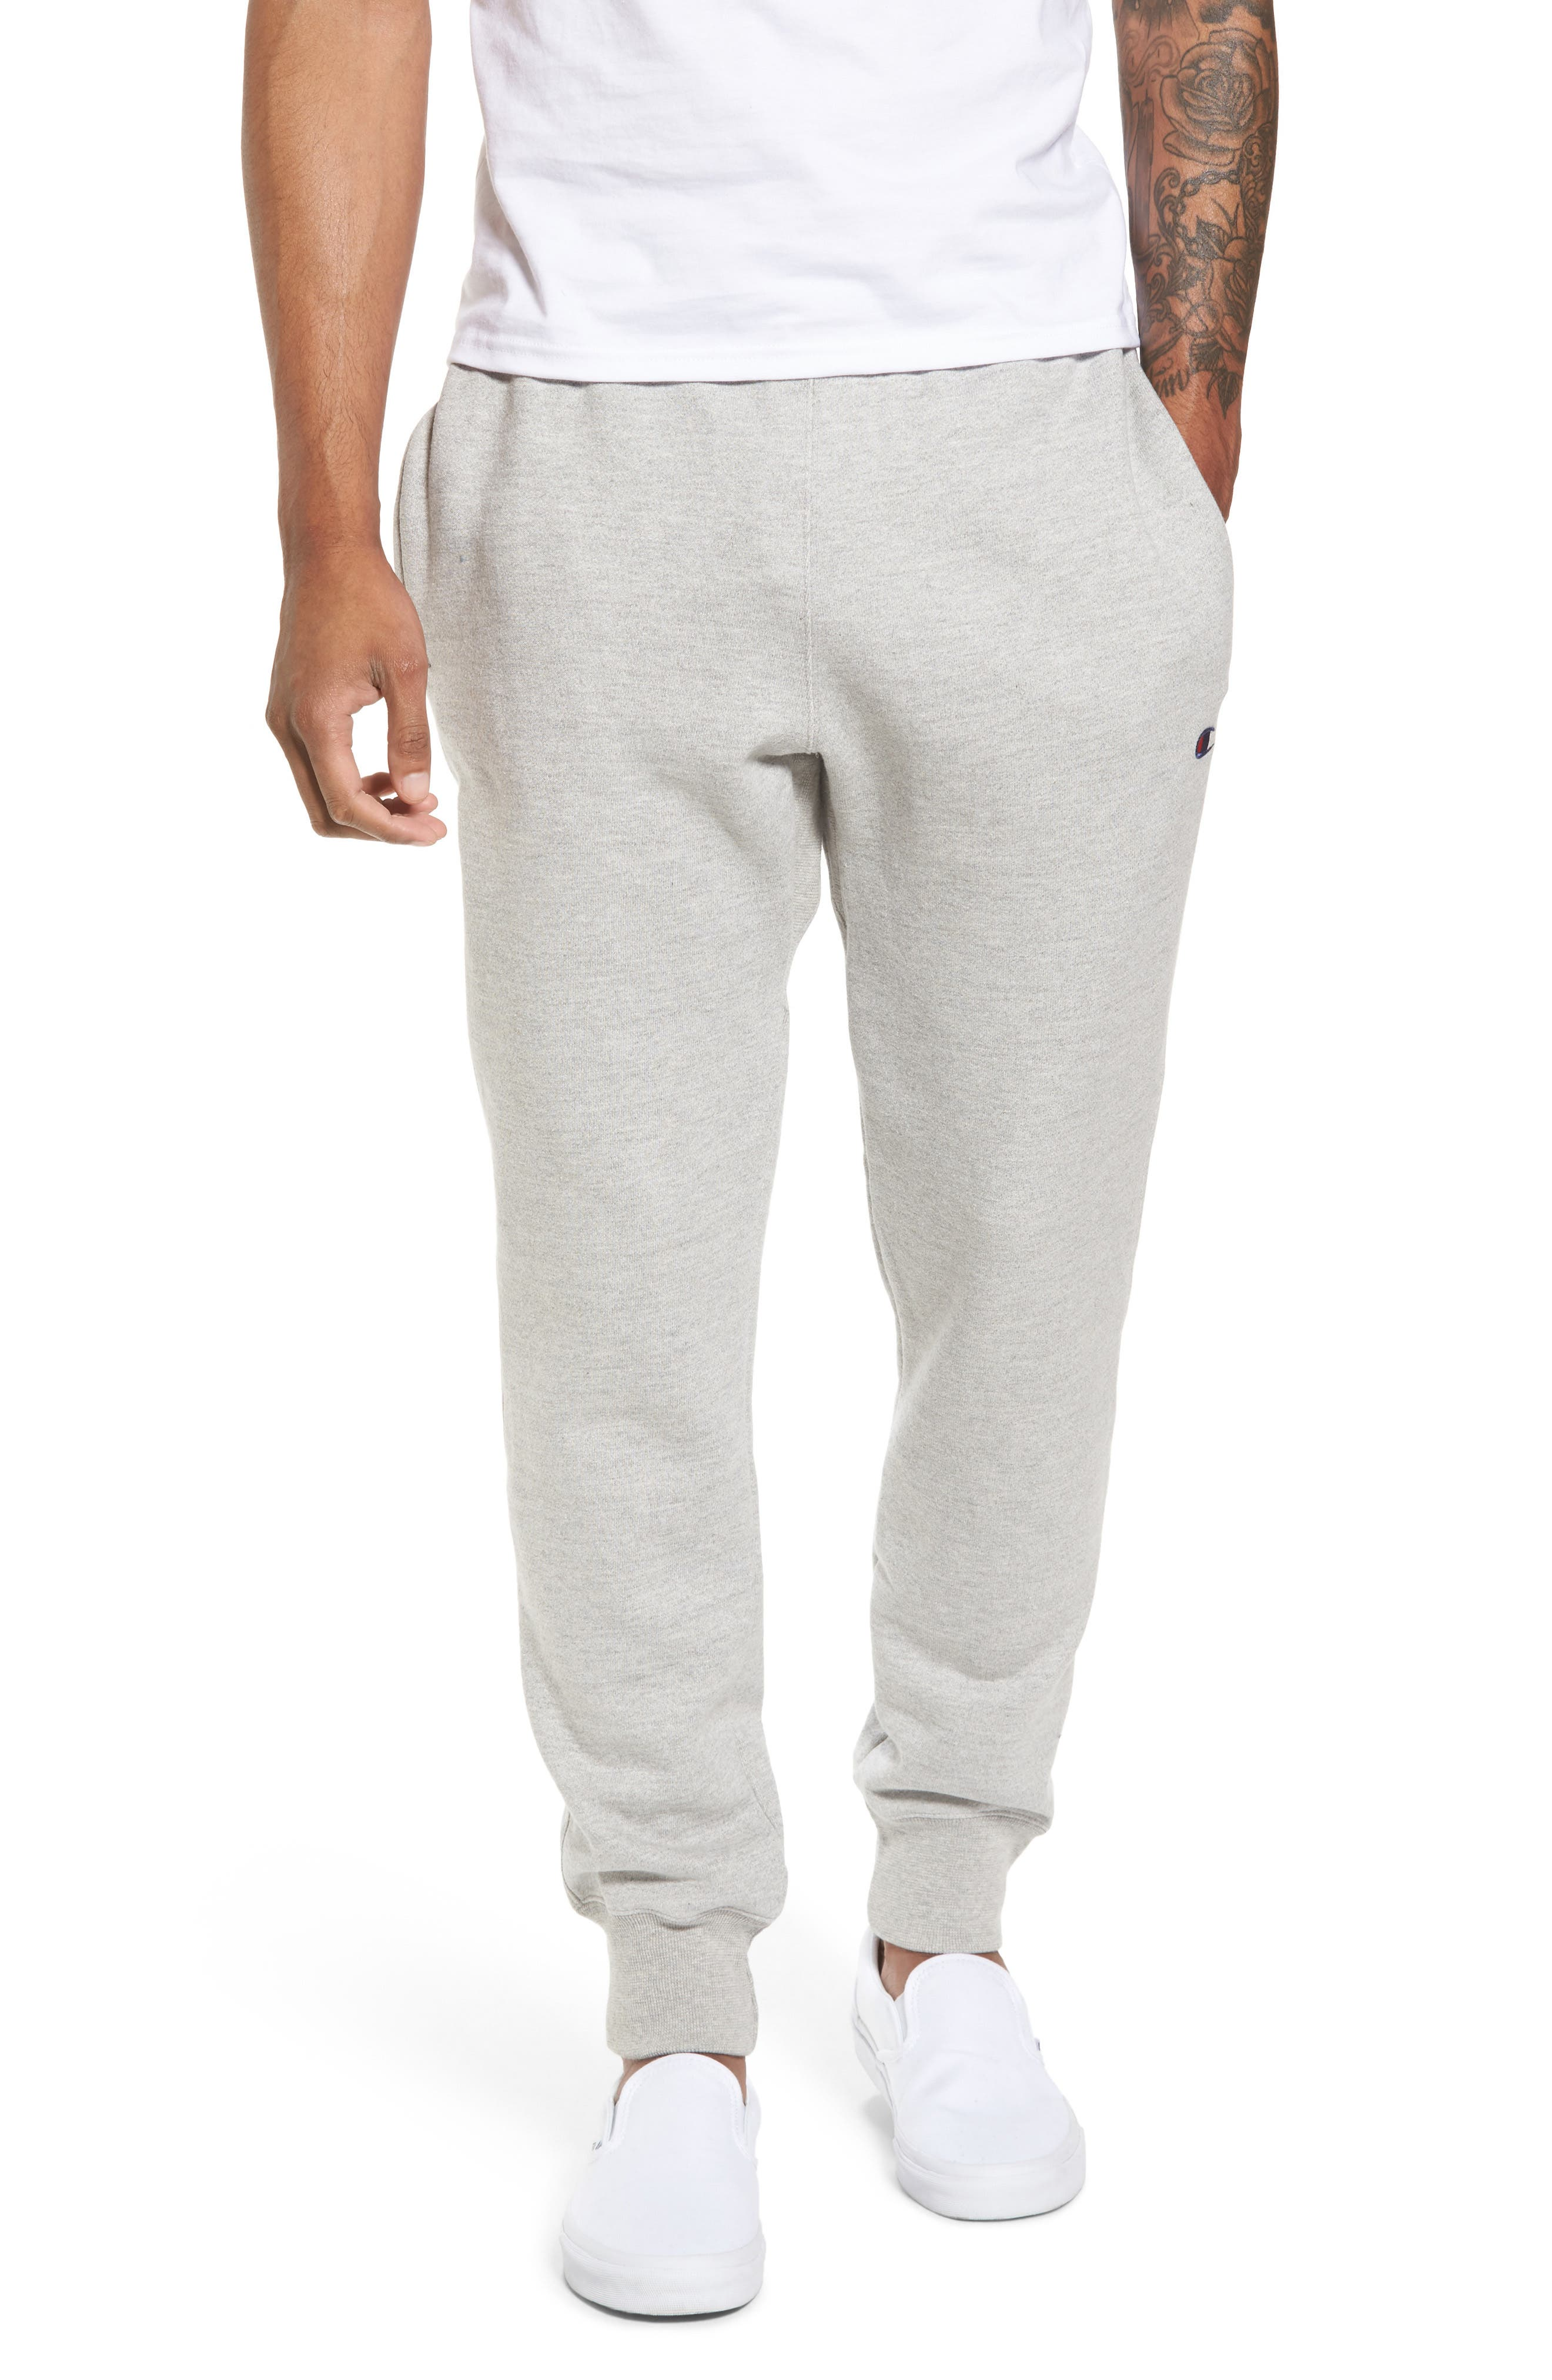 Originals Mens Sweatpants Joggers Jersey Sweat Pants Navy Small 100/% Cotton Men